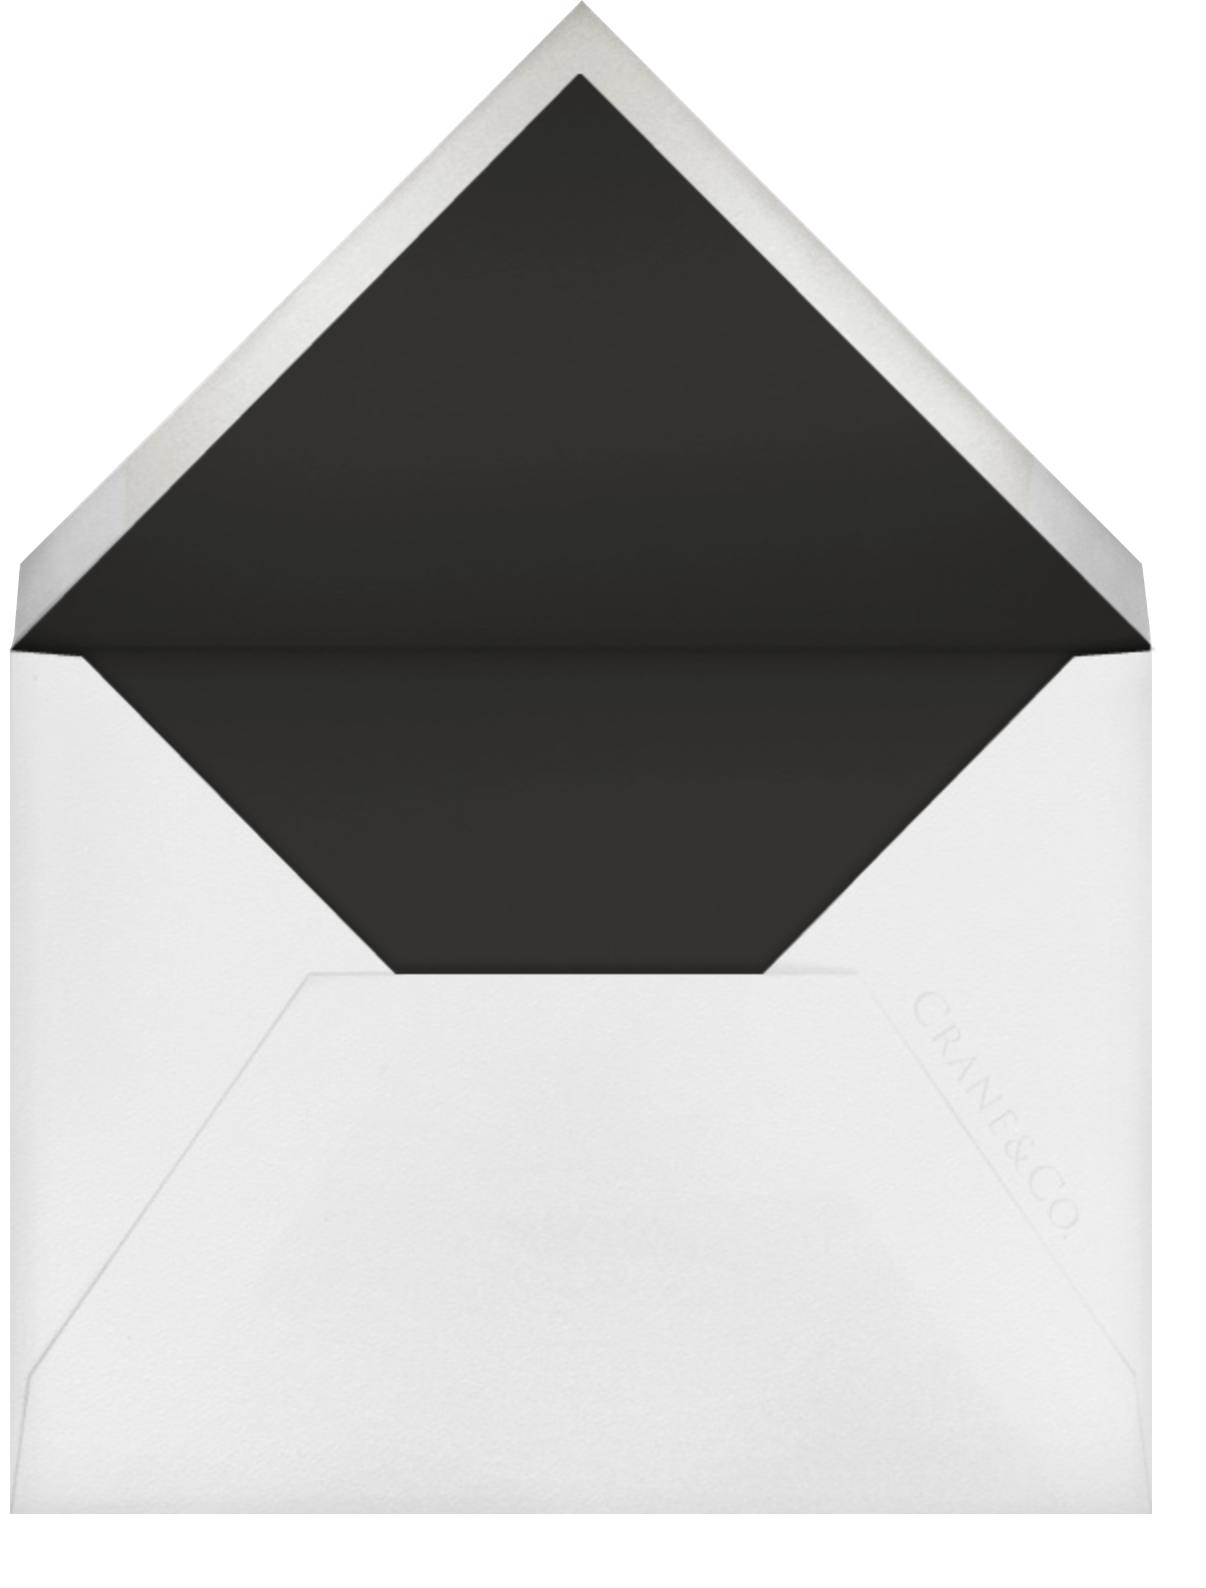 Octavo - Regent Blue - Paperless Post - Envelope